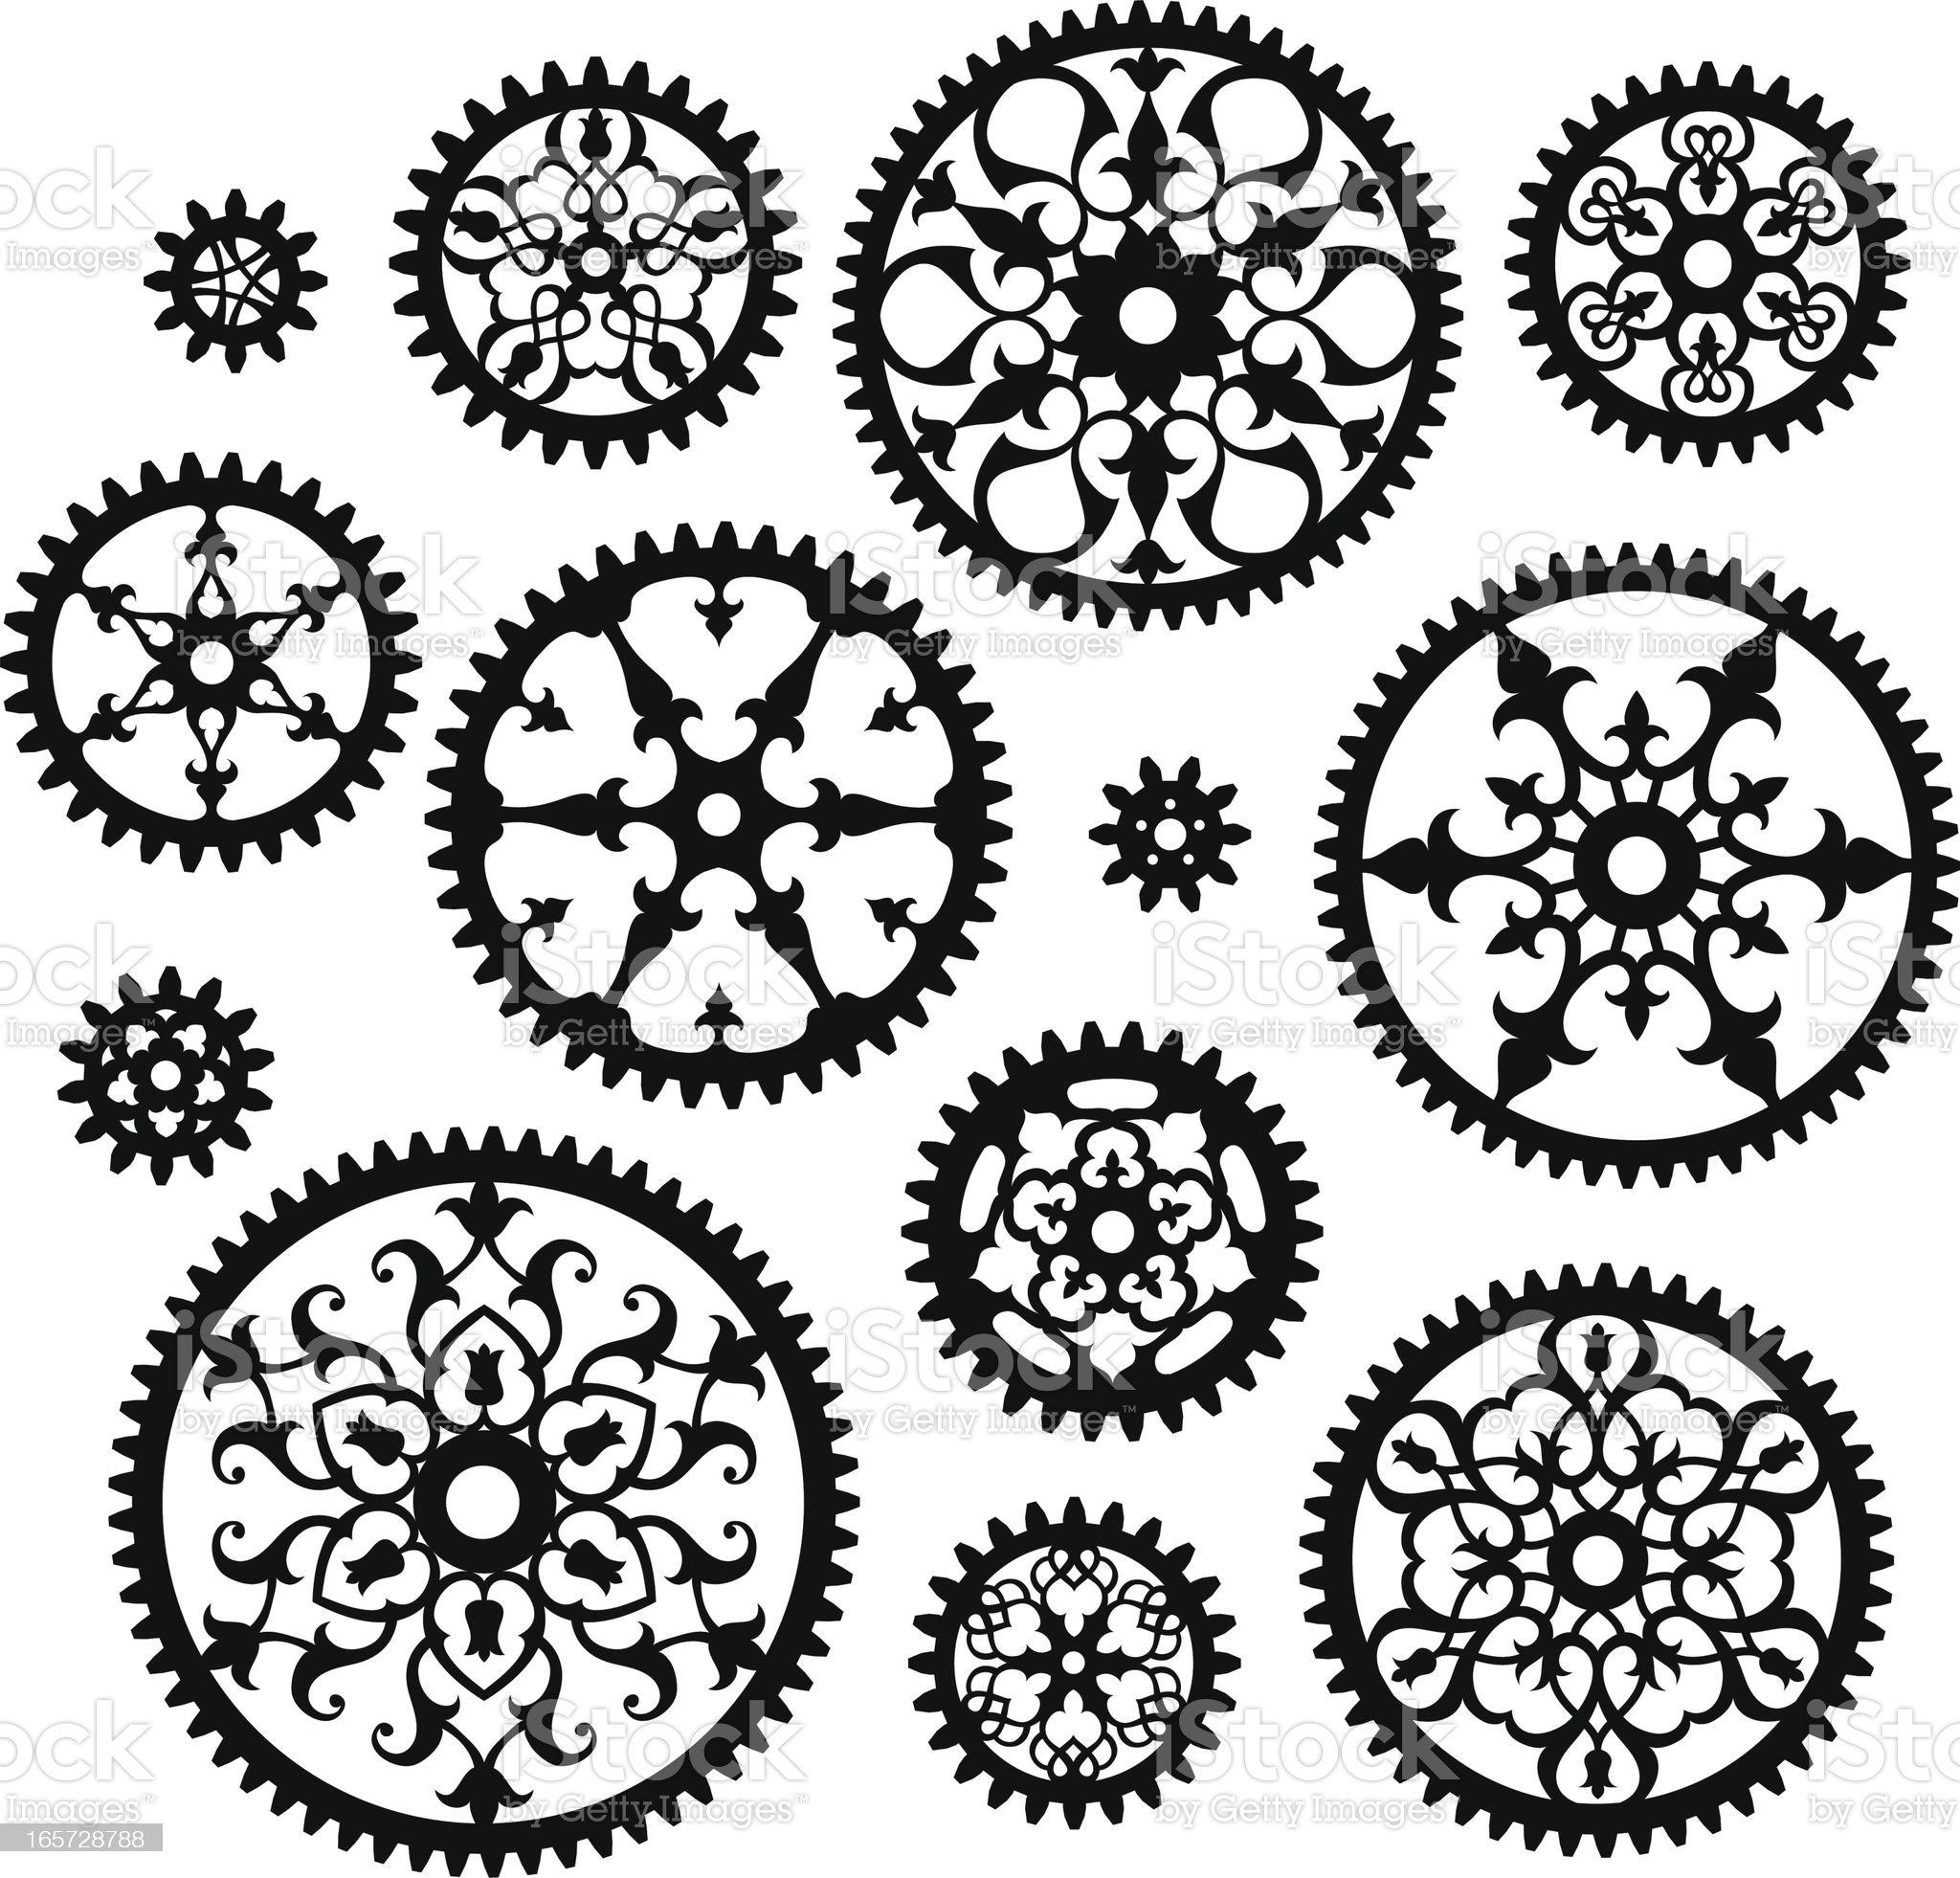 Ornate Gears royalty-free stock vector art